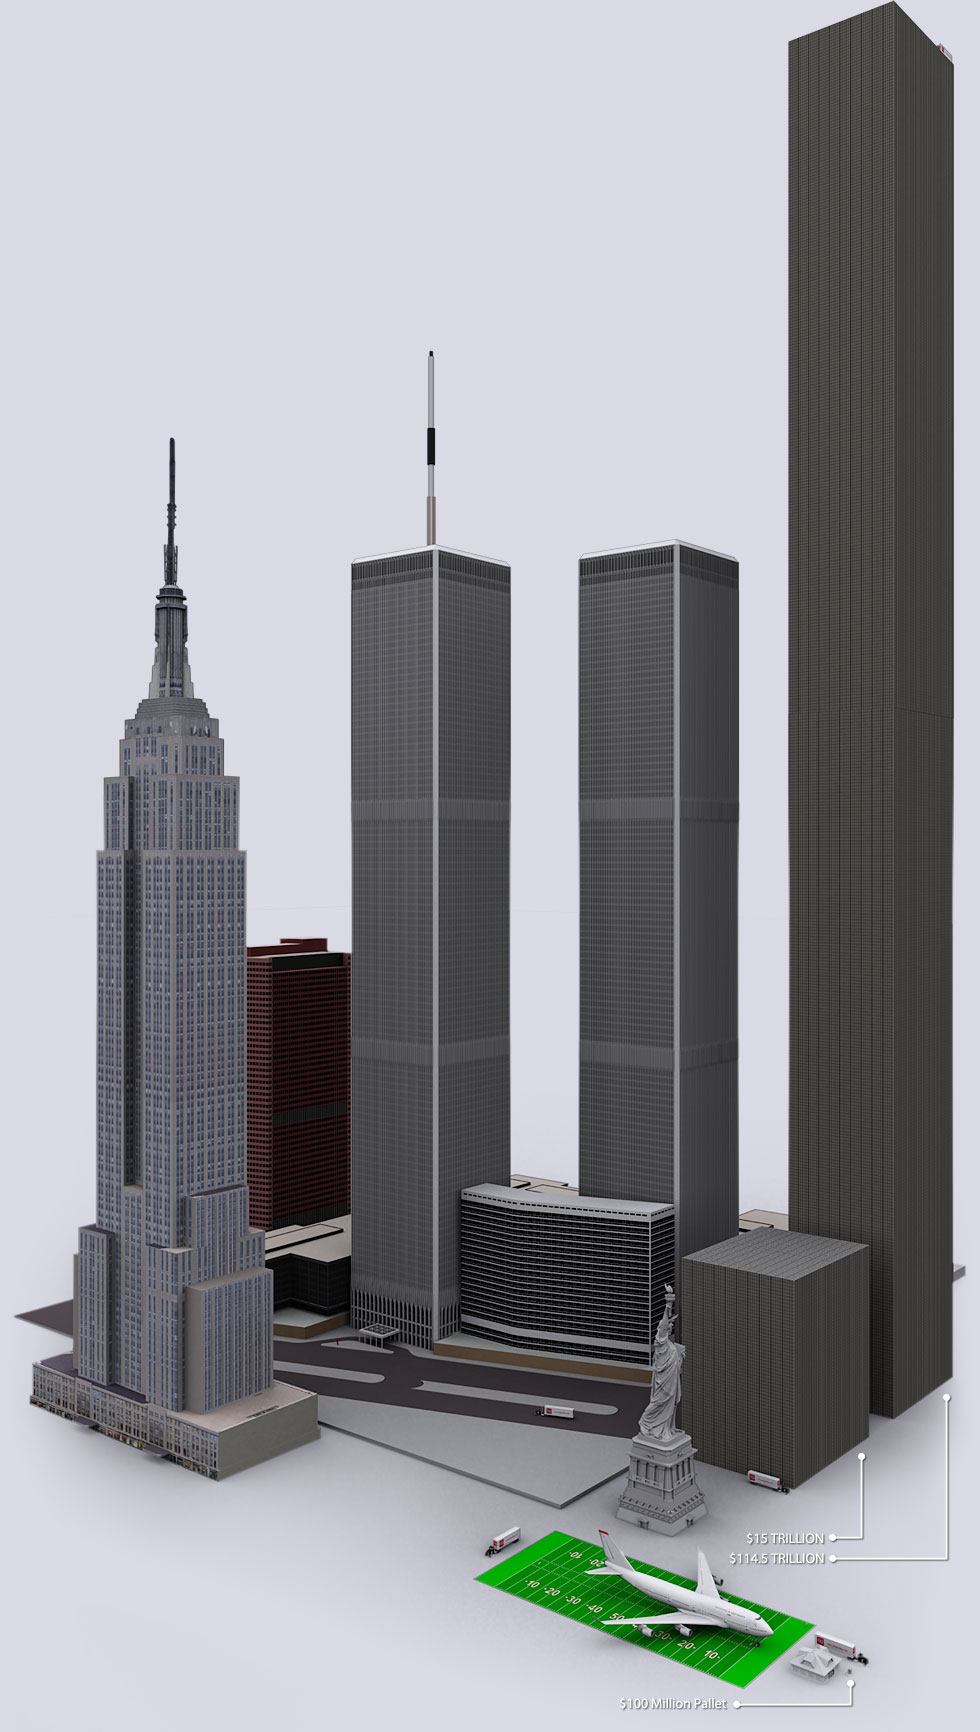 114.5 Trillion Dollars